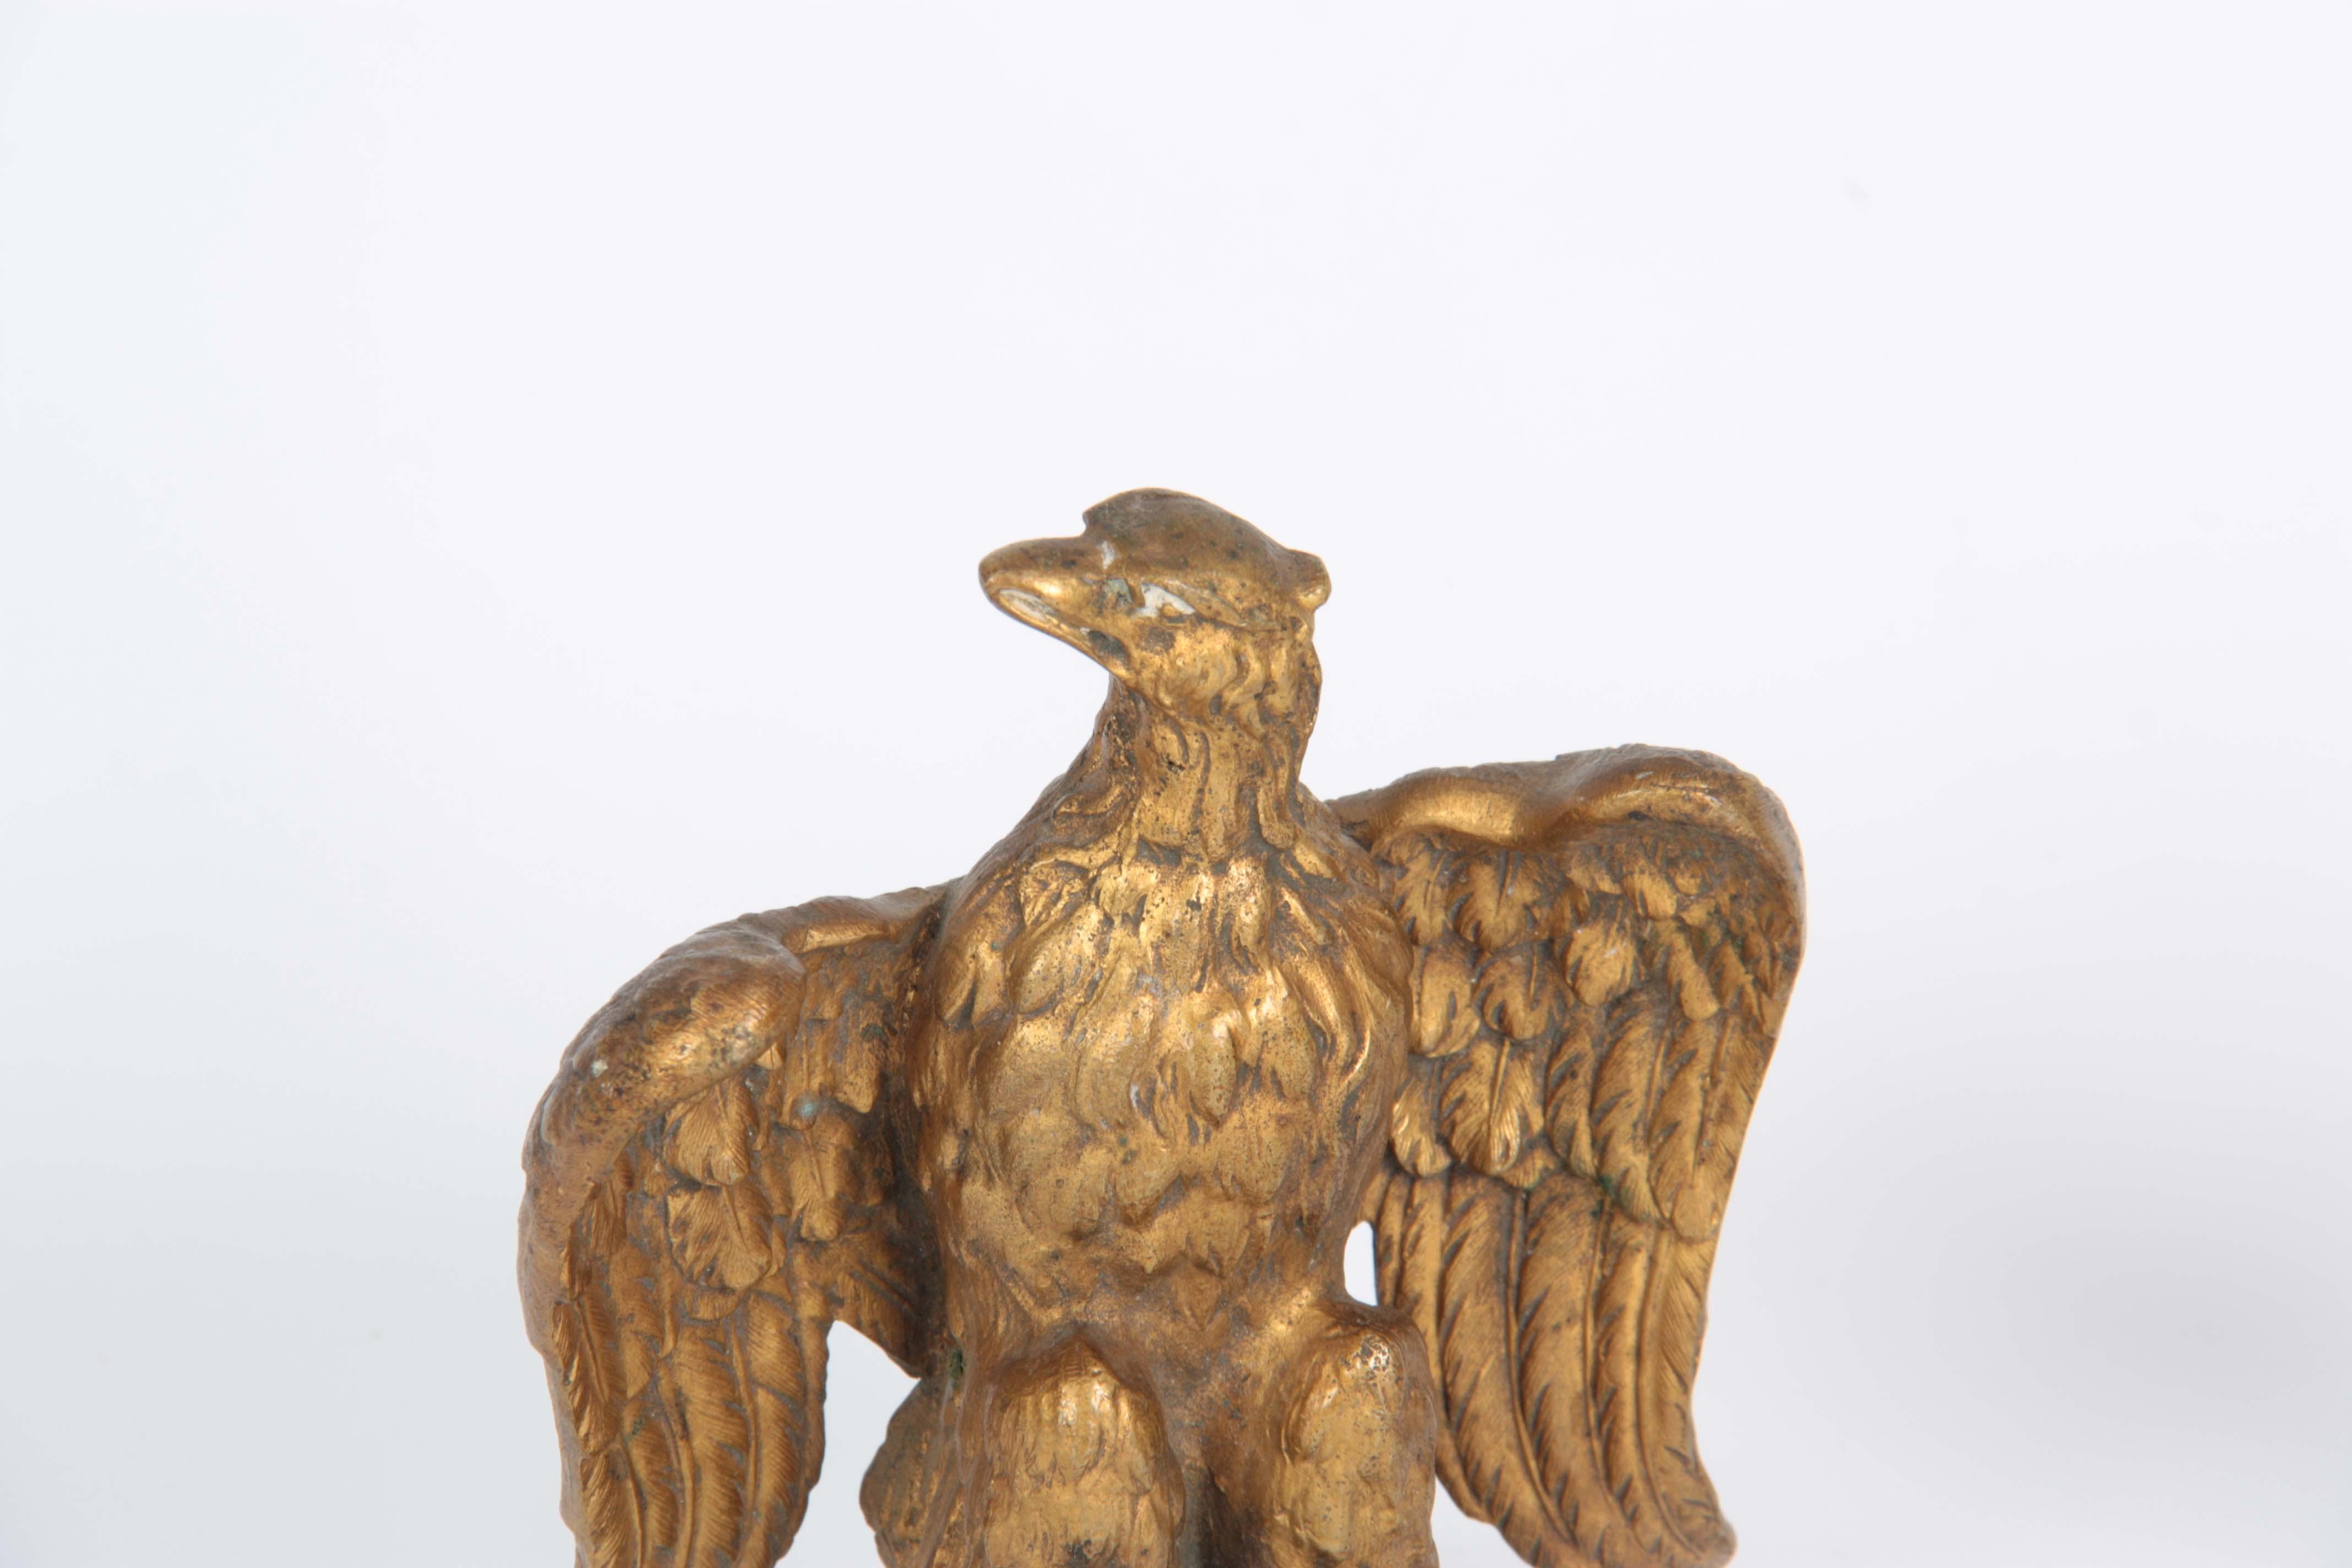 Lot 642 - A PAIR OF 19TH CENTURY GILT BRONZE EAGLES 12cm wide 14.5cm high.